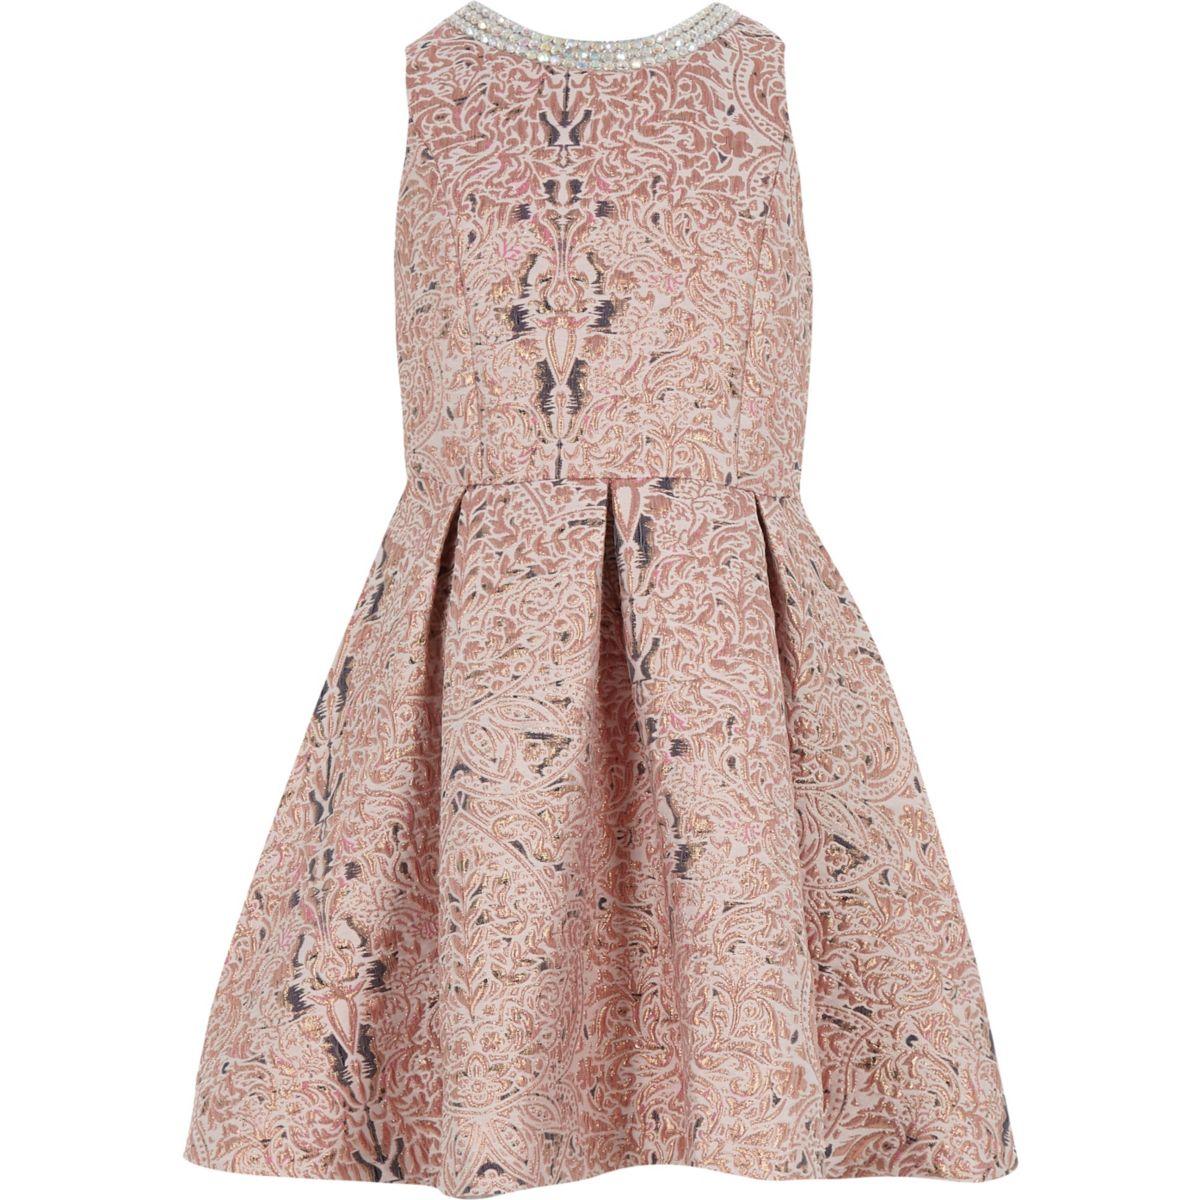 Girls pink metallic jacquard prom dress